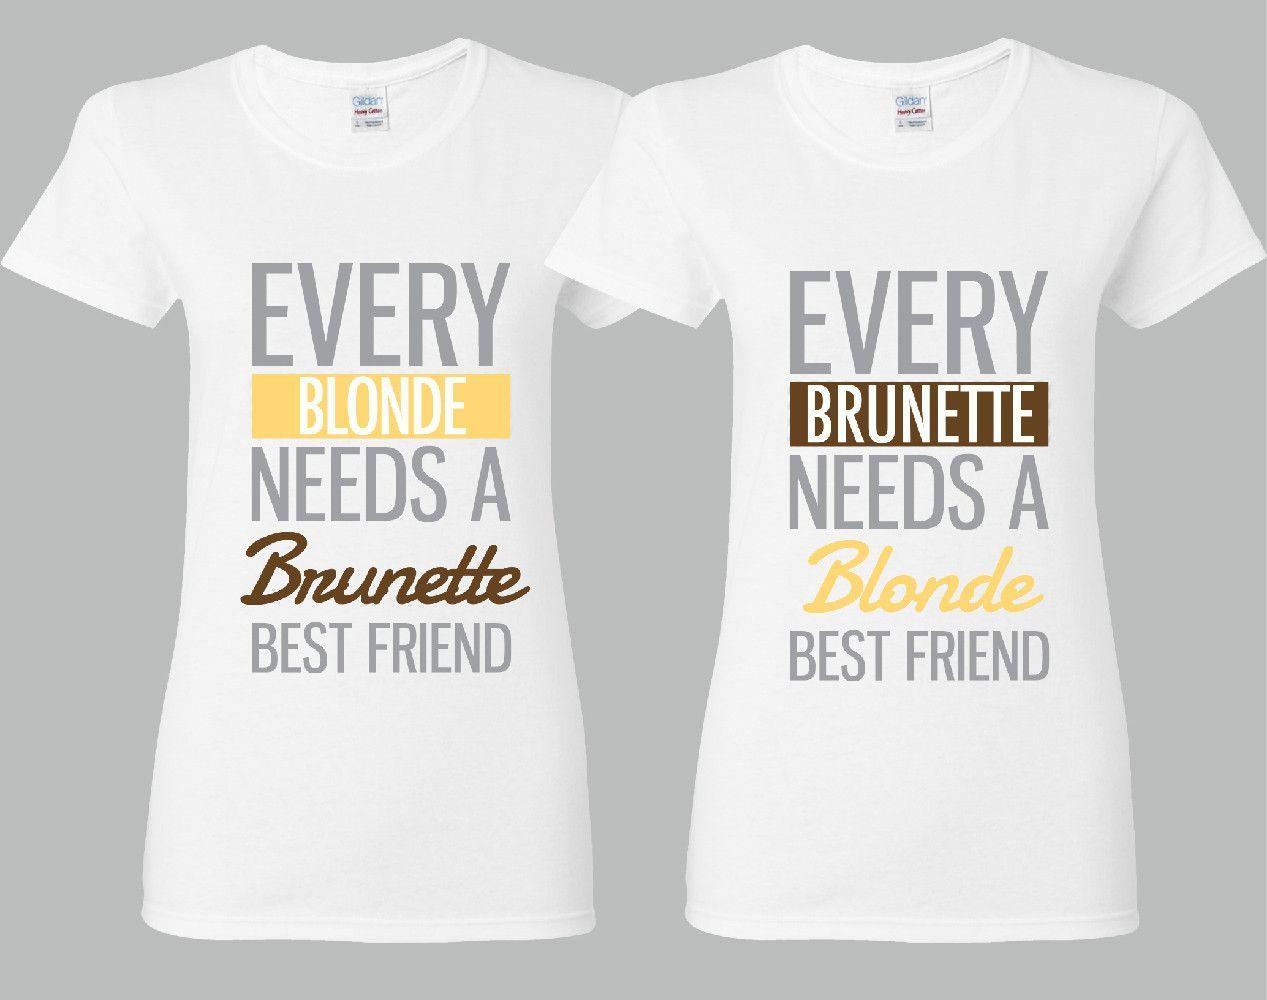 Every Blonde Needs A Brunette - Every Brunette Needs A Blonde Girl BFFS T-shirts